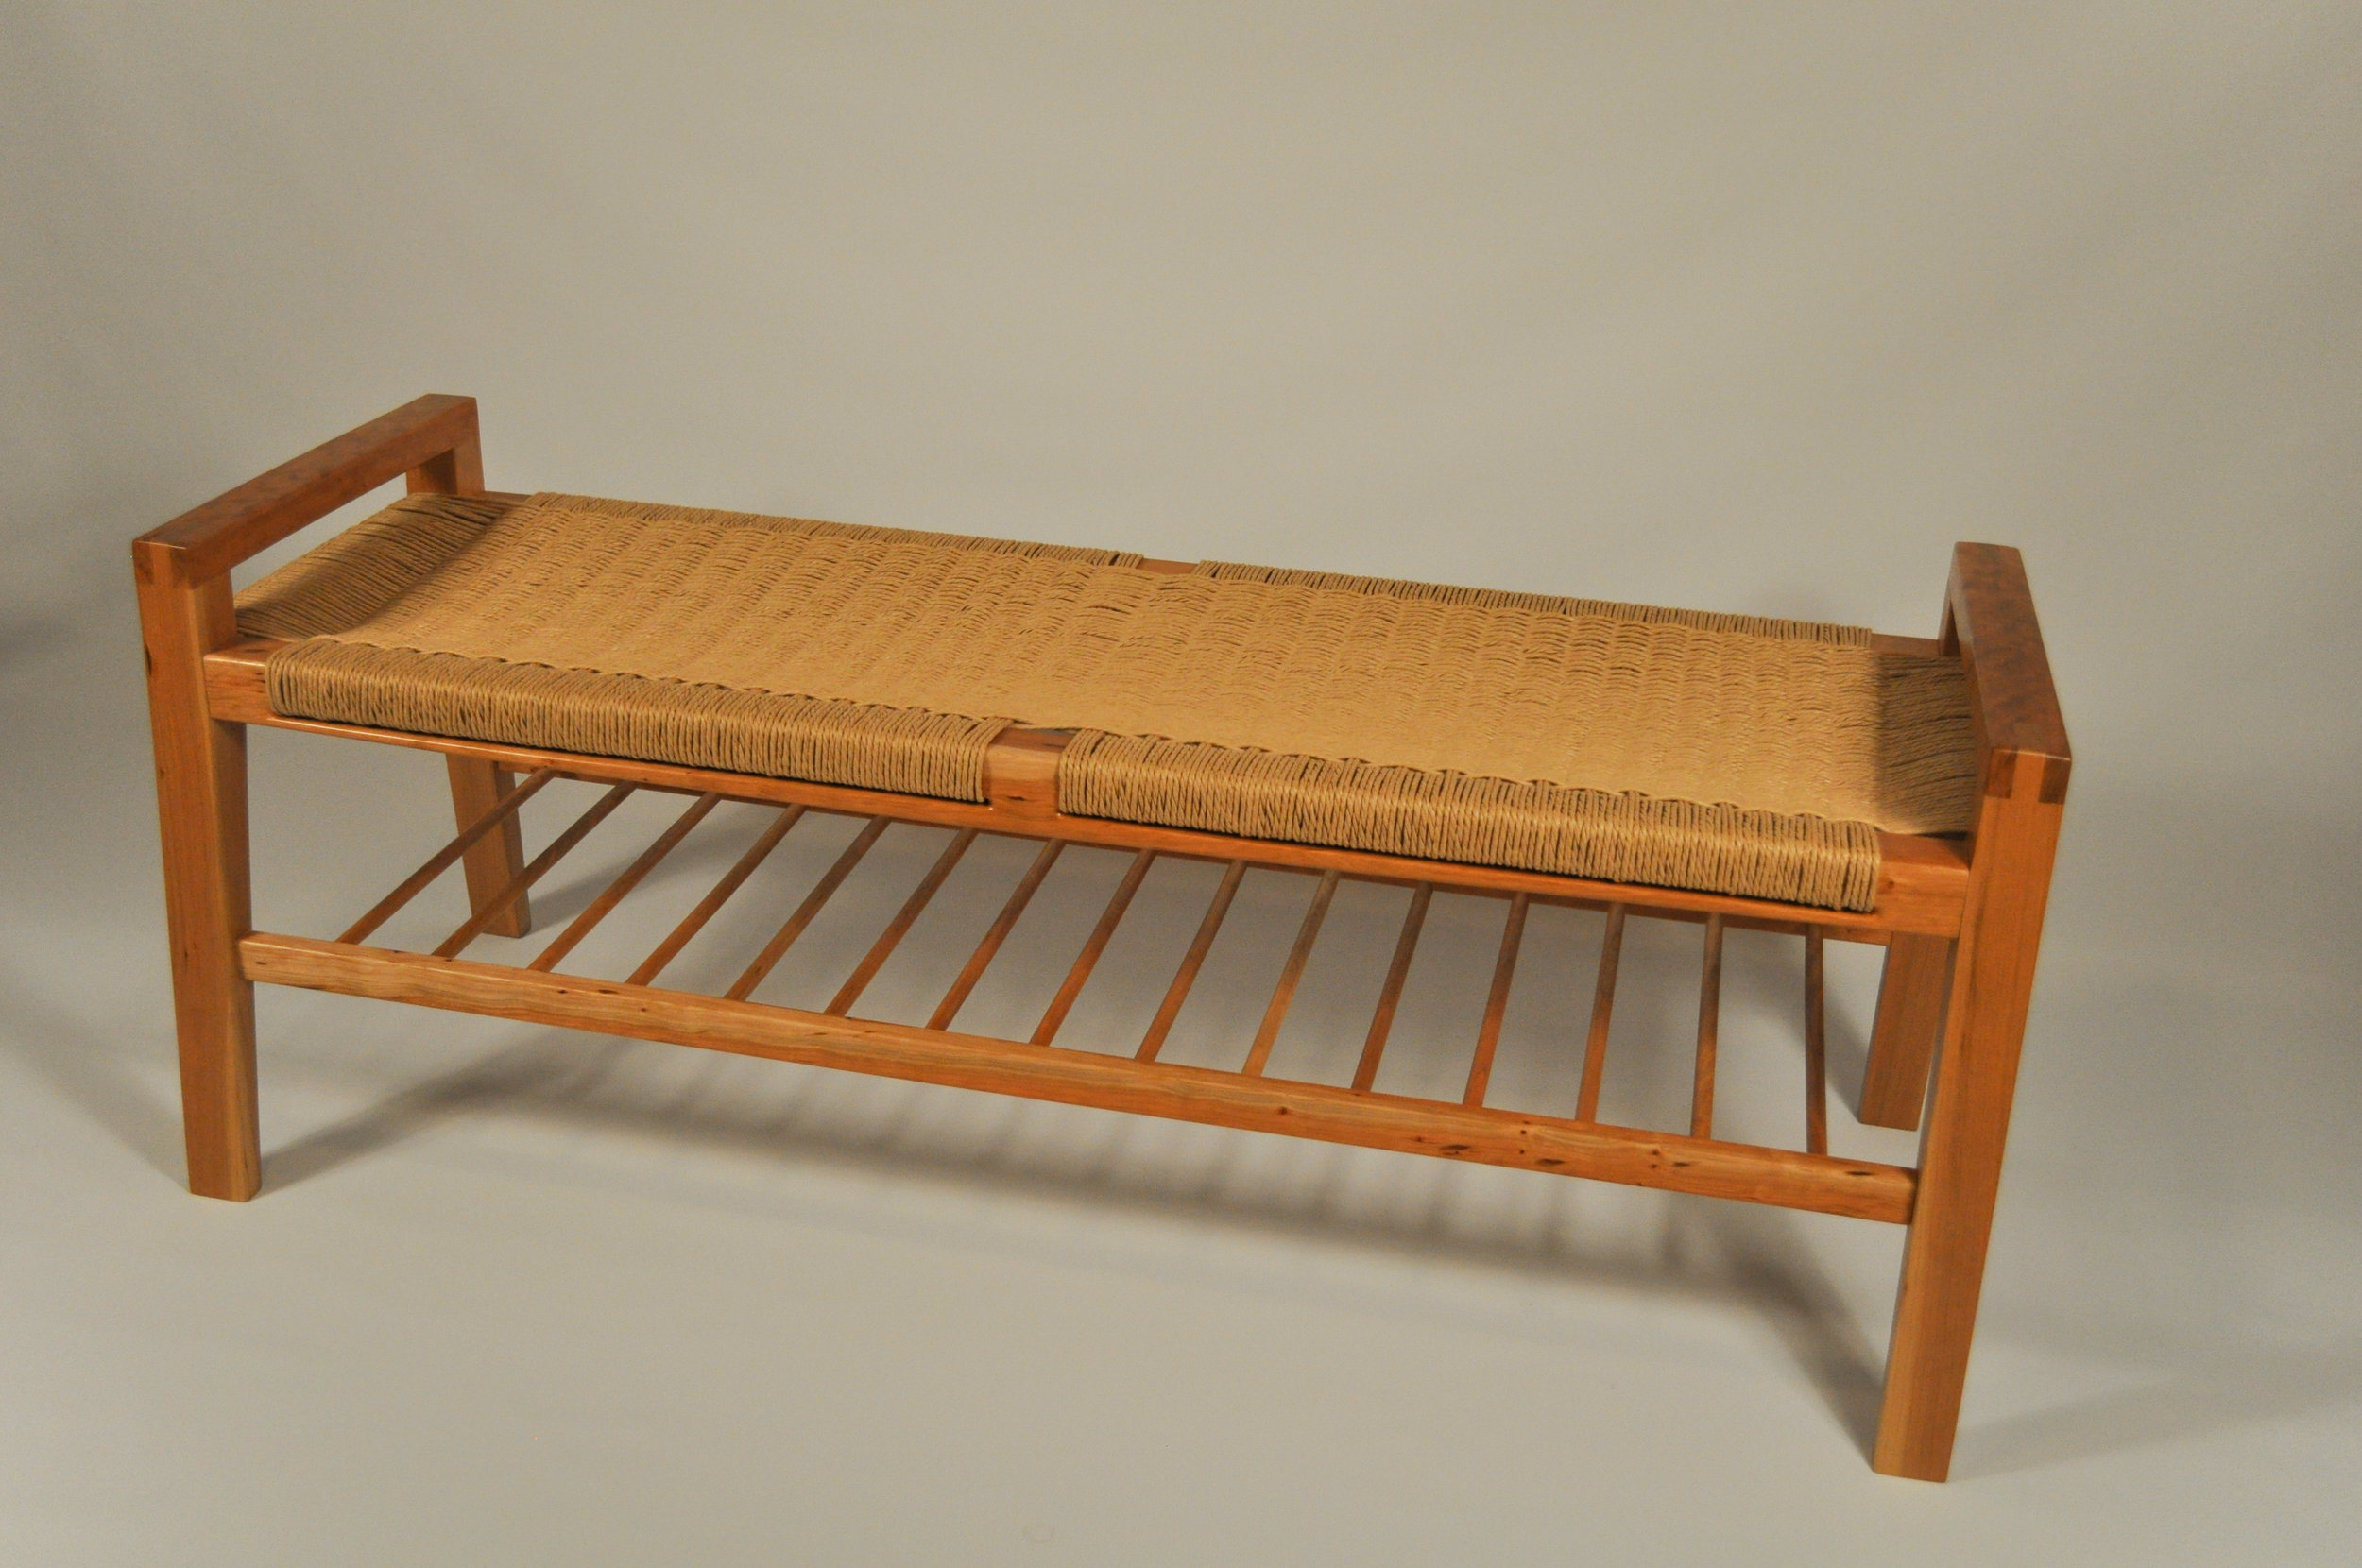 Sutton Bench With Shelf Sutton Projekt Furniture Maker Honolulu Hawai I